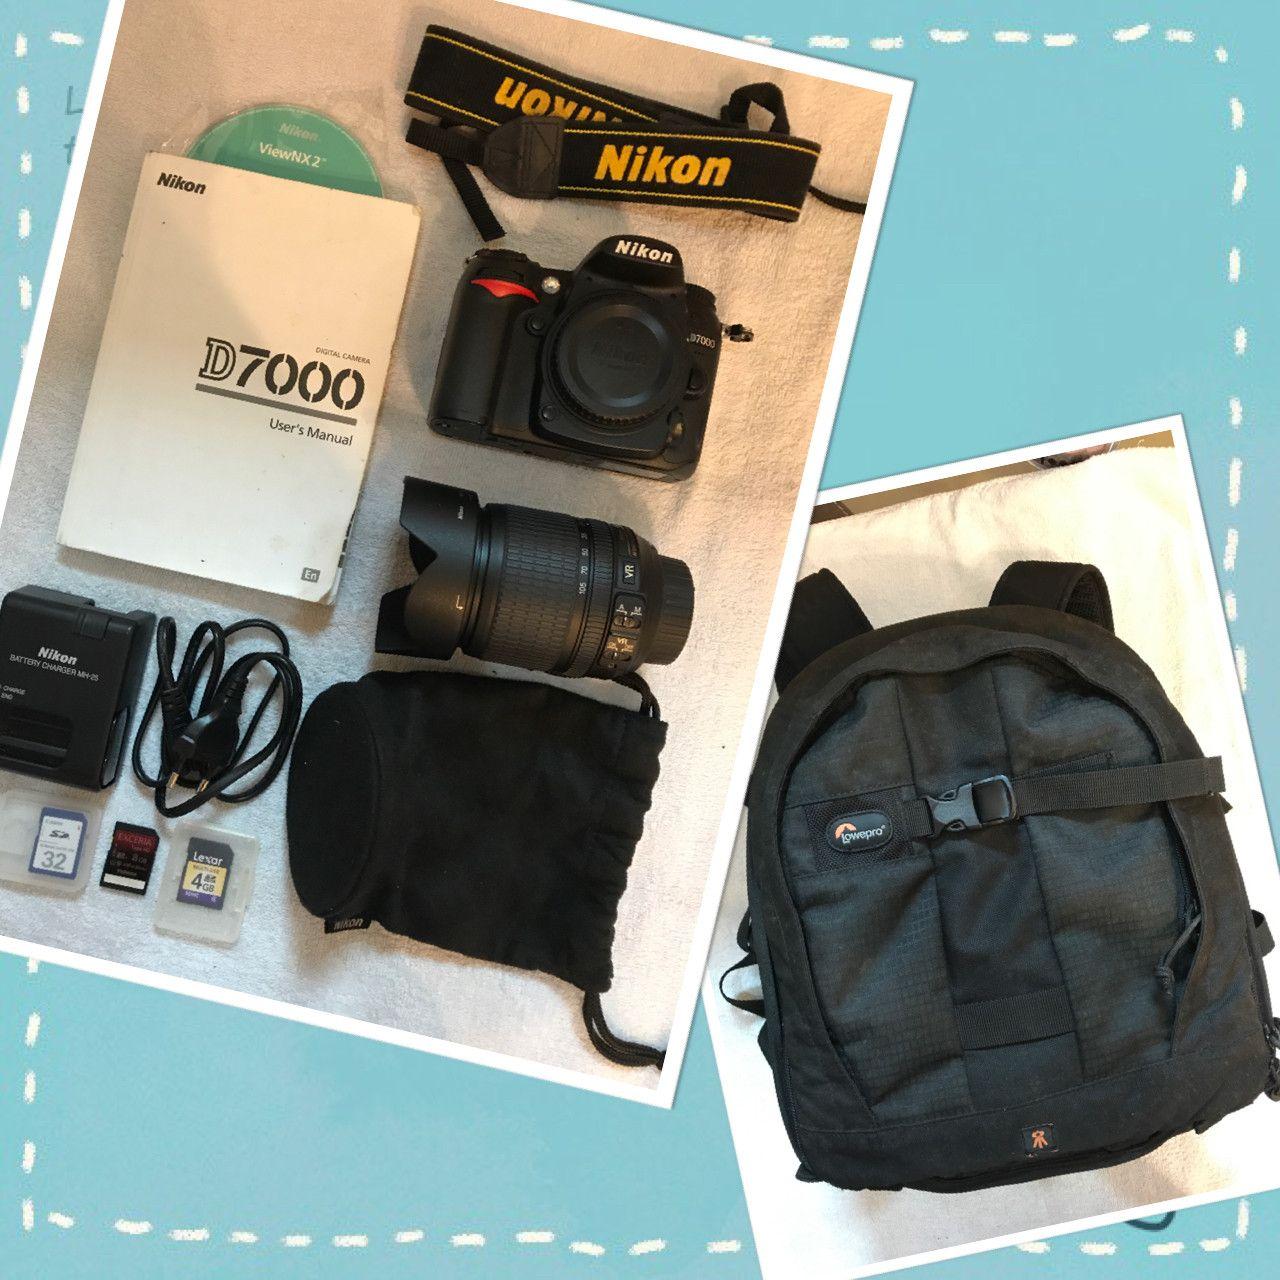 Pristine Free Camera Bag Nikon Dubai Uae Storat Nikon D7000 Manual Lens Settings Nikon D7000 Manual Movie Settings dpreview Nikon D7000 Manual